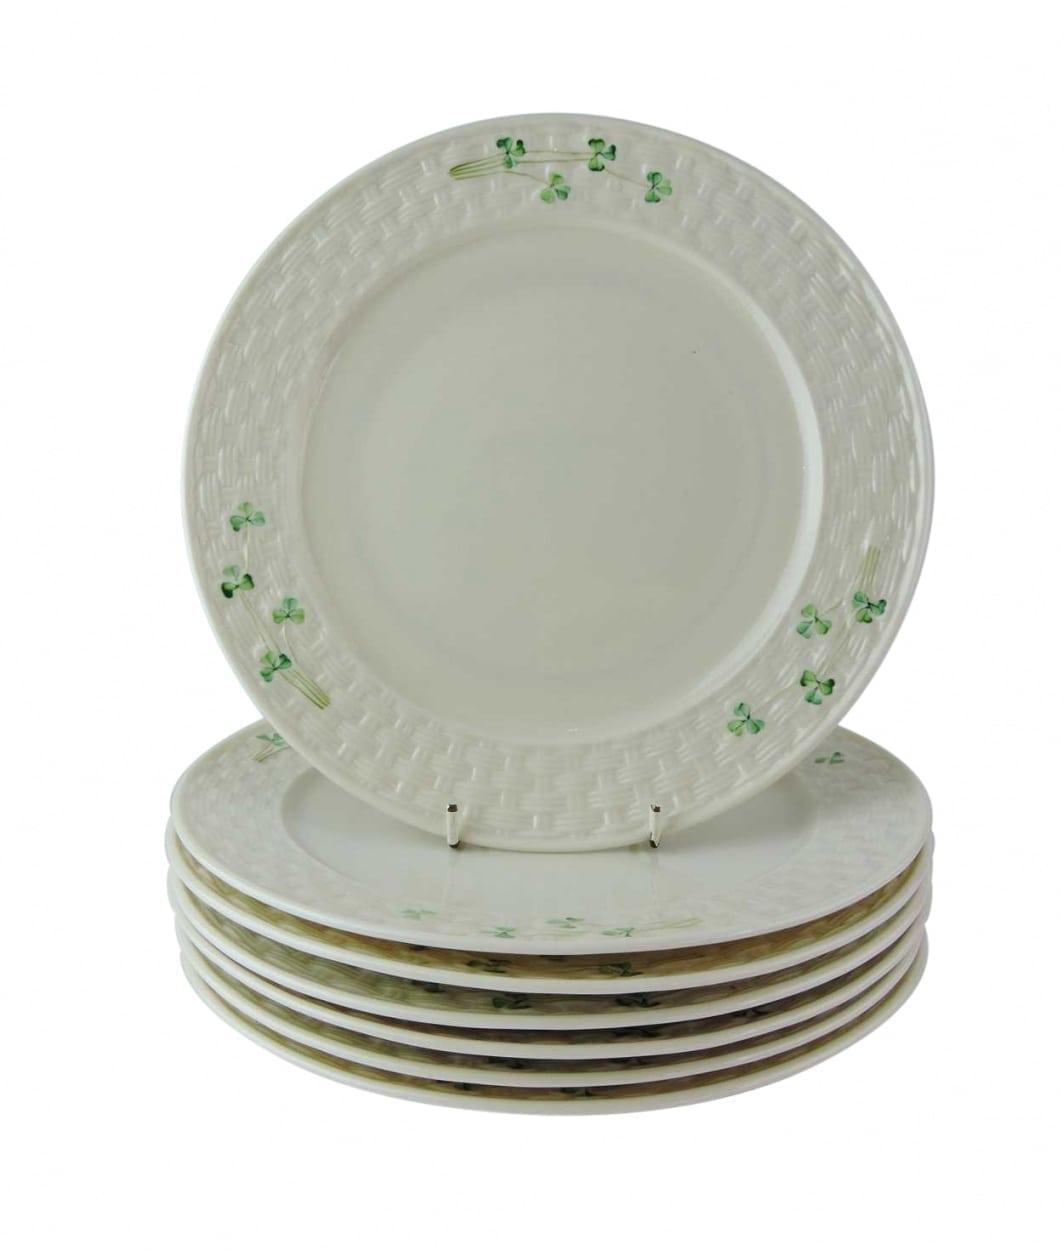 Belleek Shamrock Dinner Plate